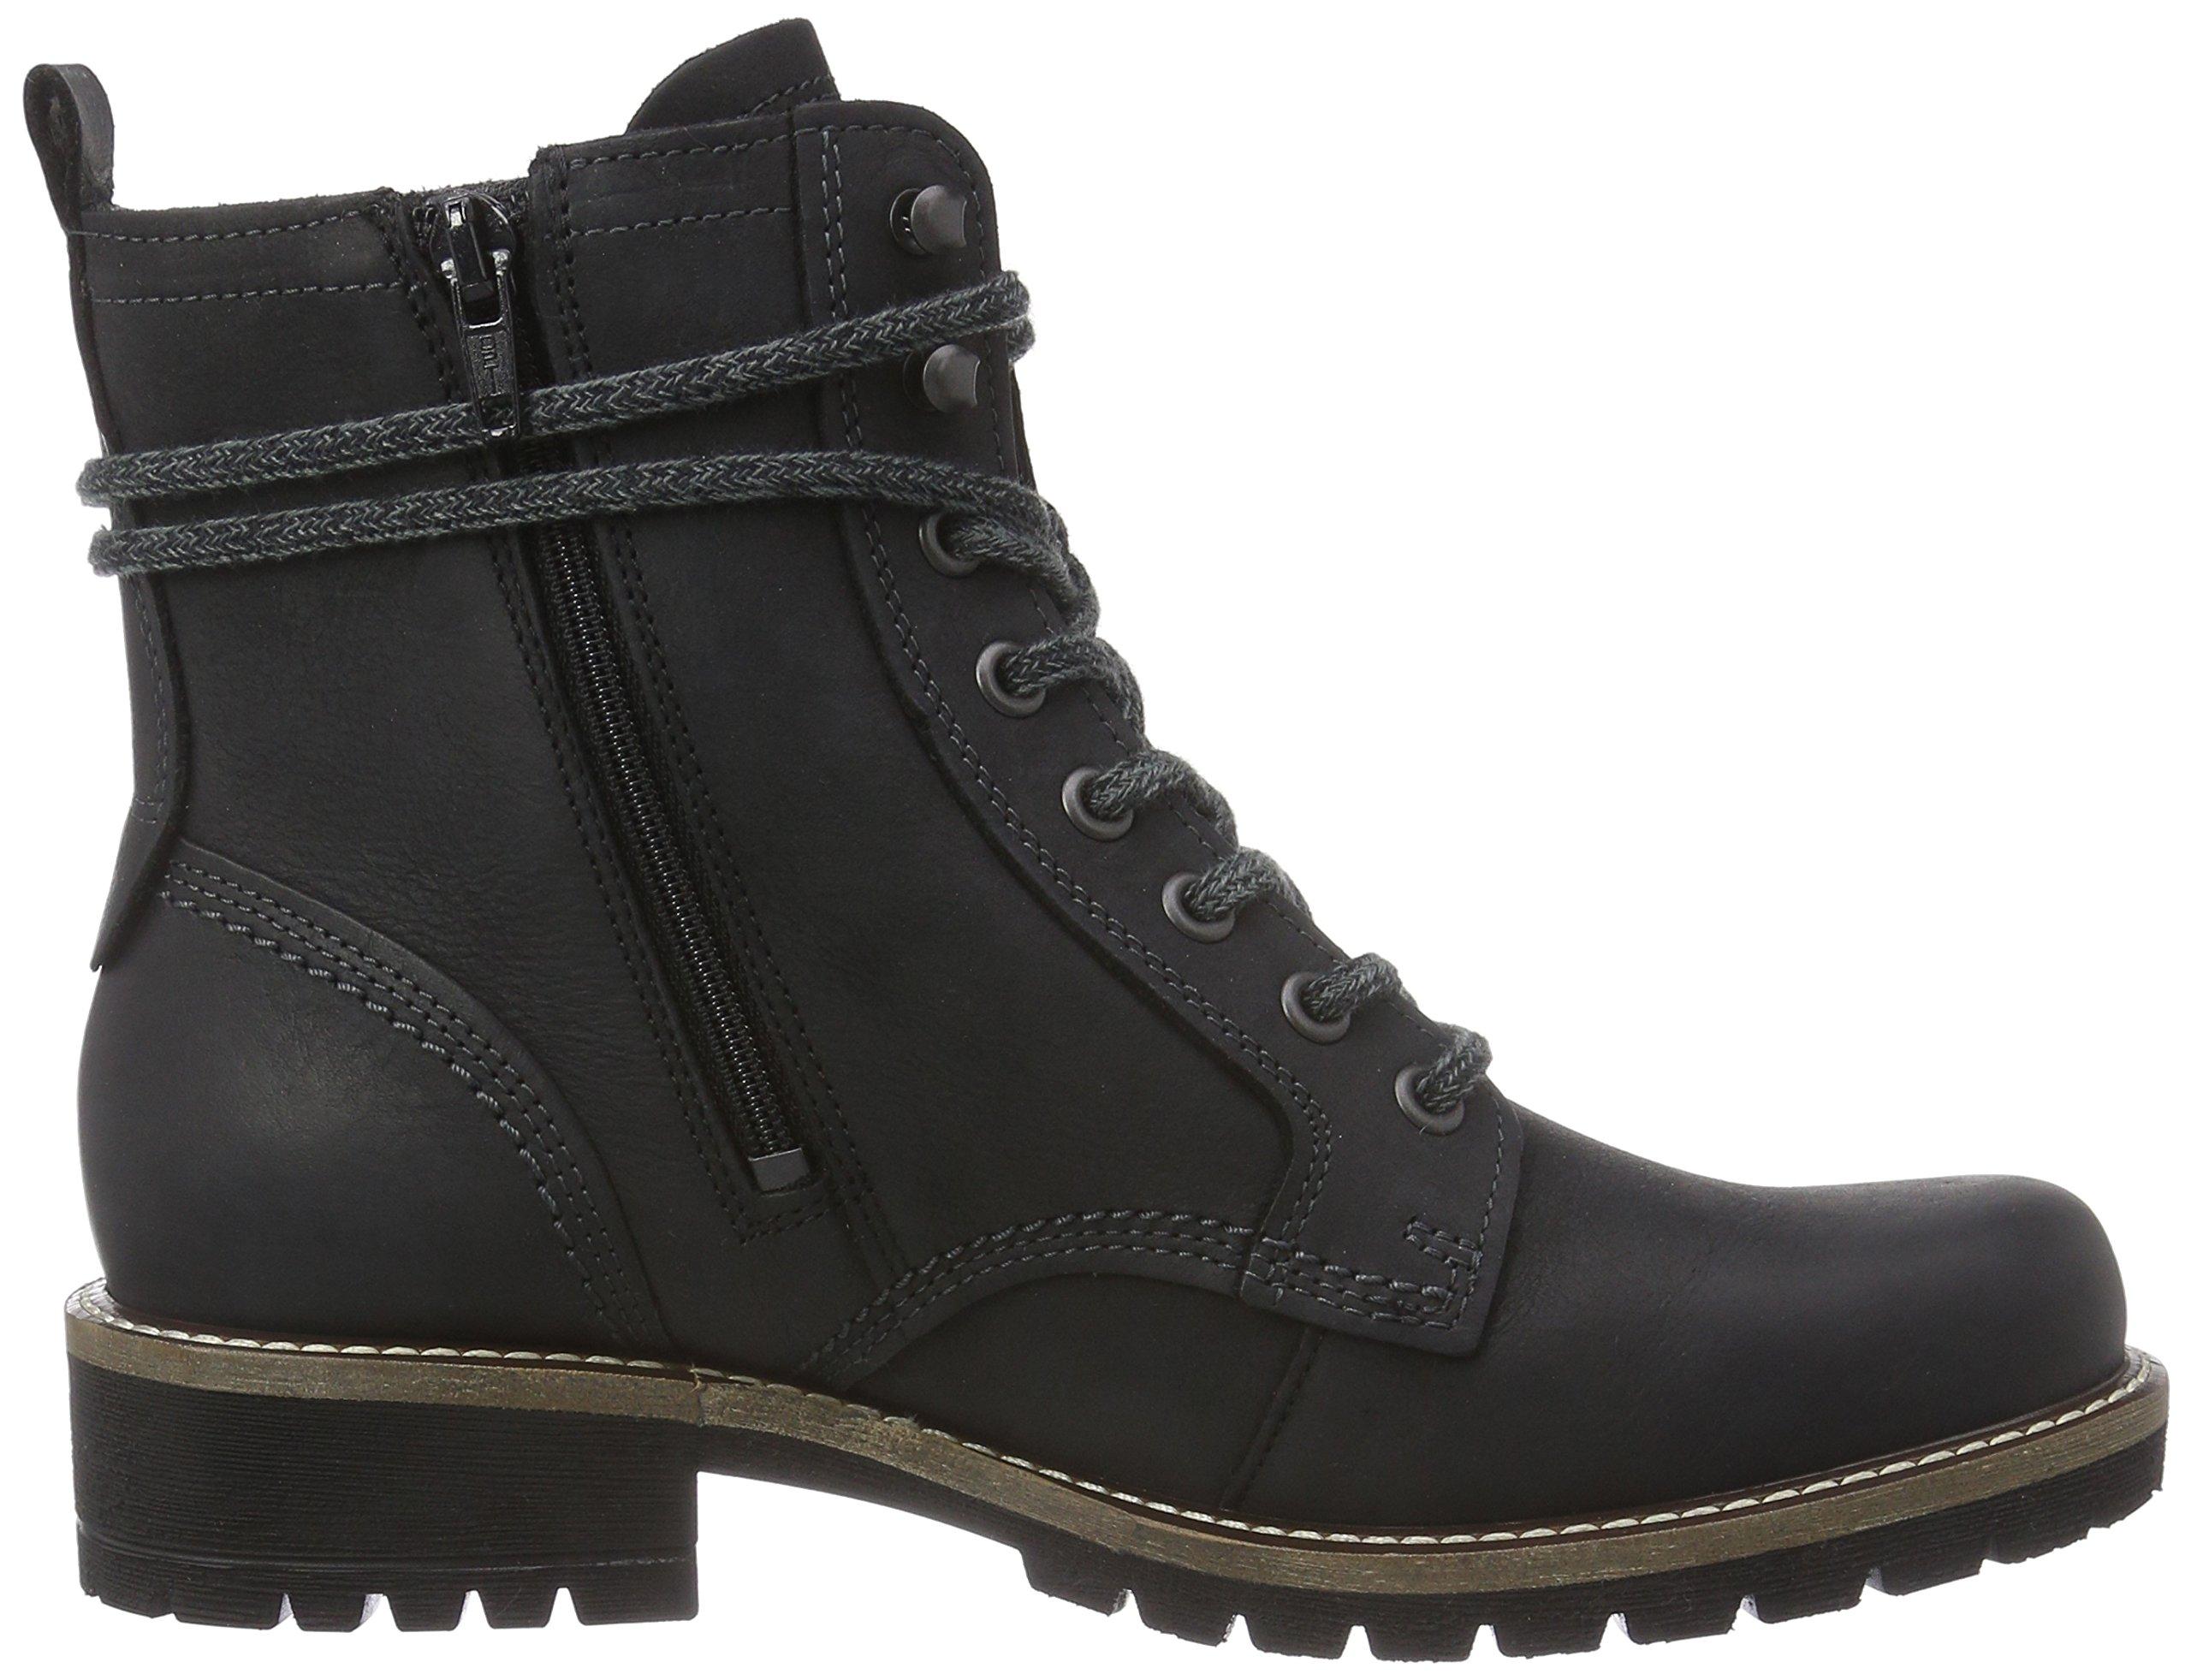 Ecco Footwear Womens Elaine Boot, Black, 37 EU/6-6.5 M US by ECCO (Image #7)